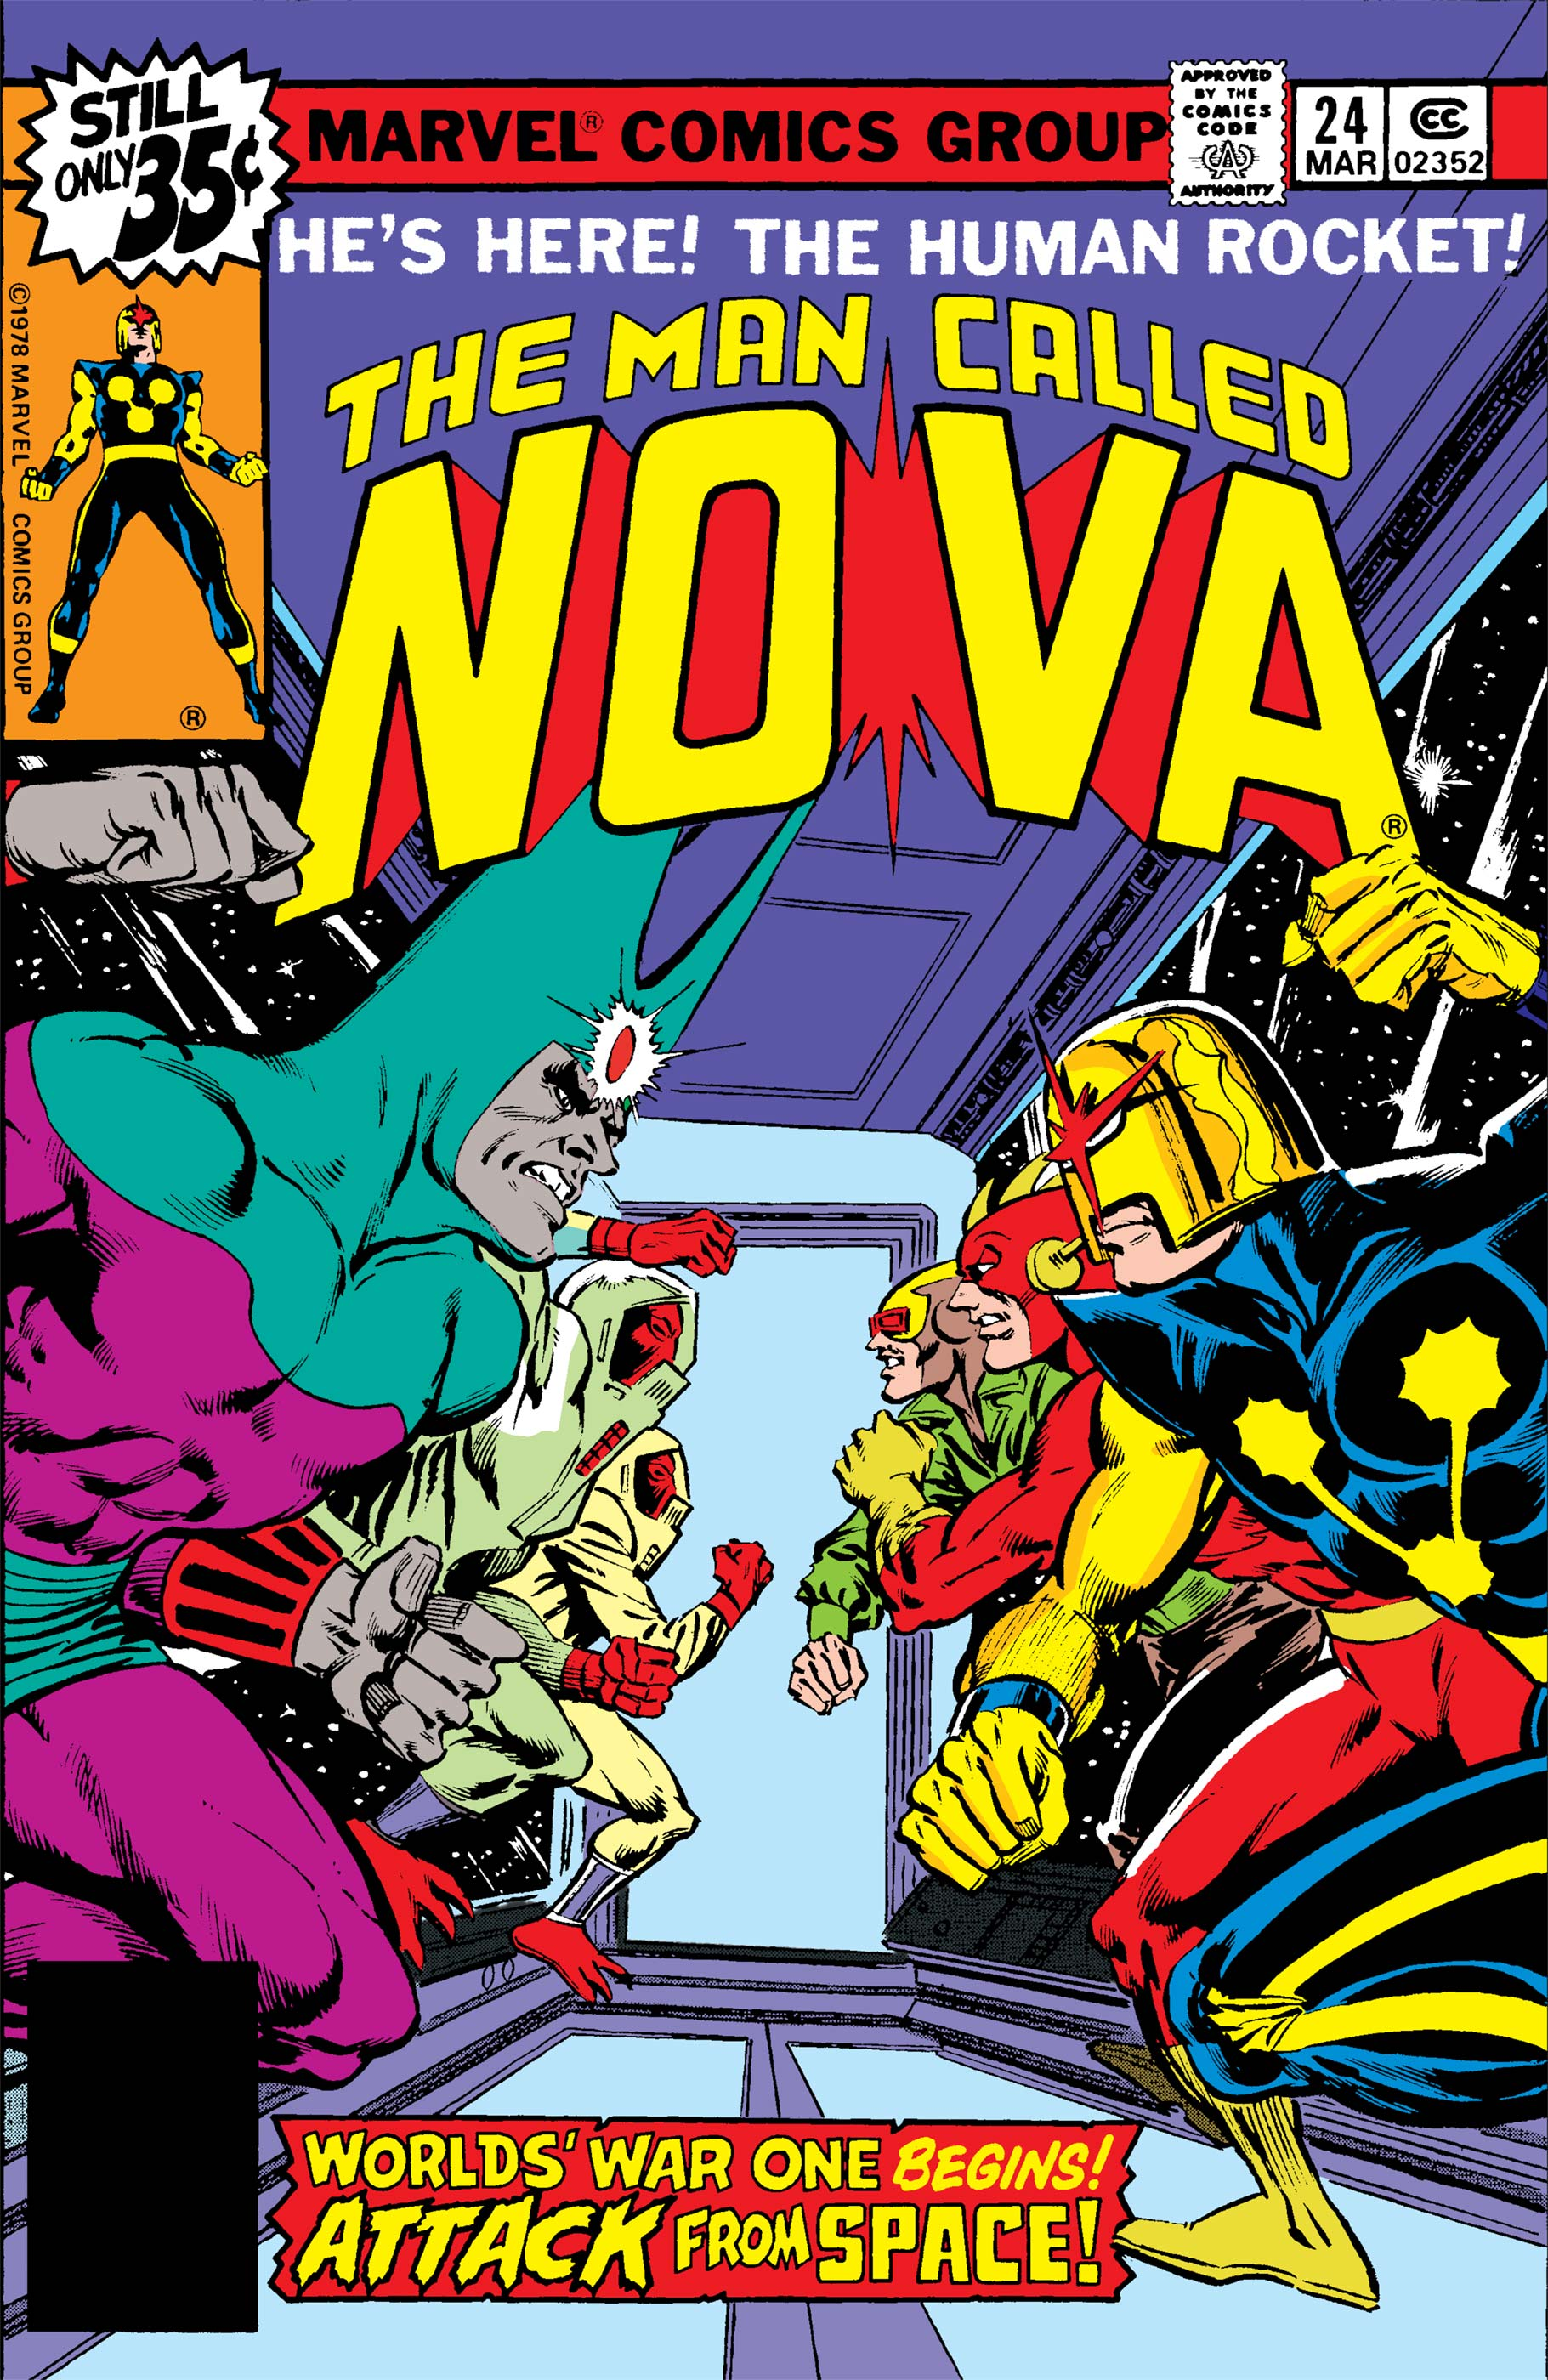 Nova (1976) #24